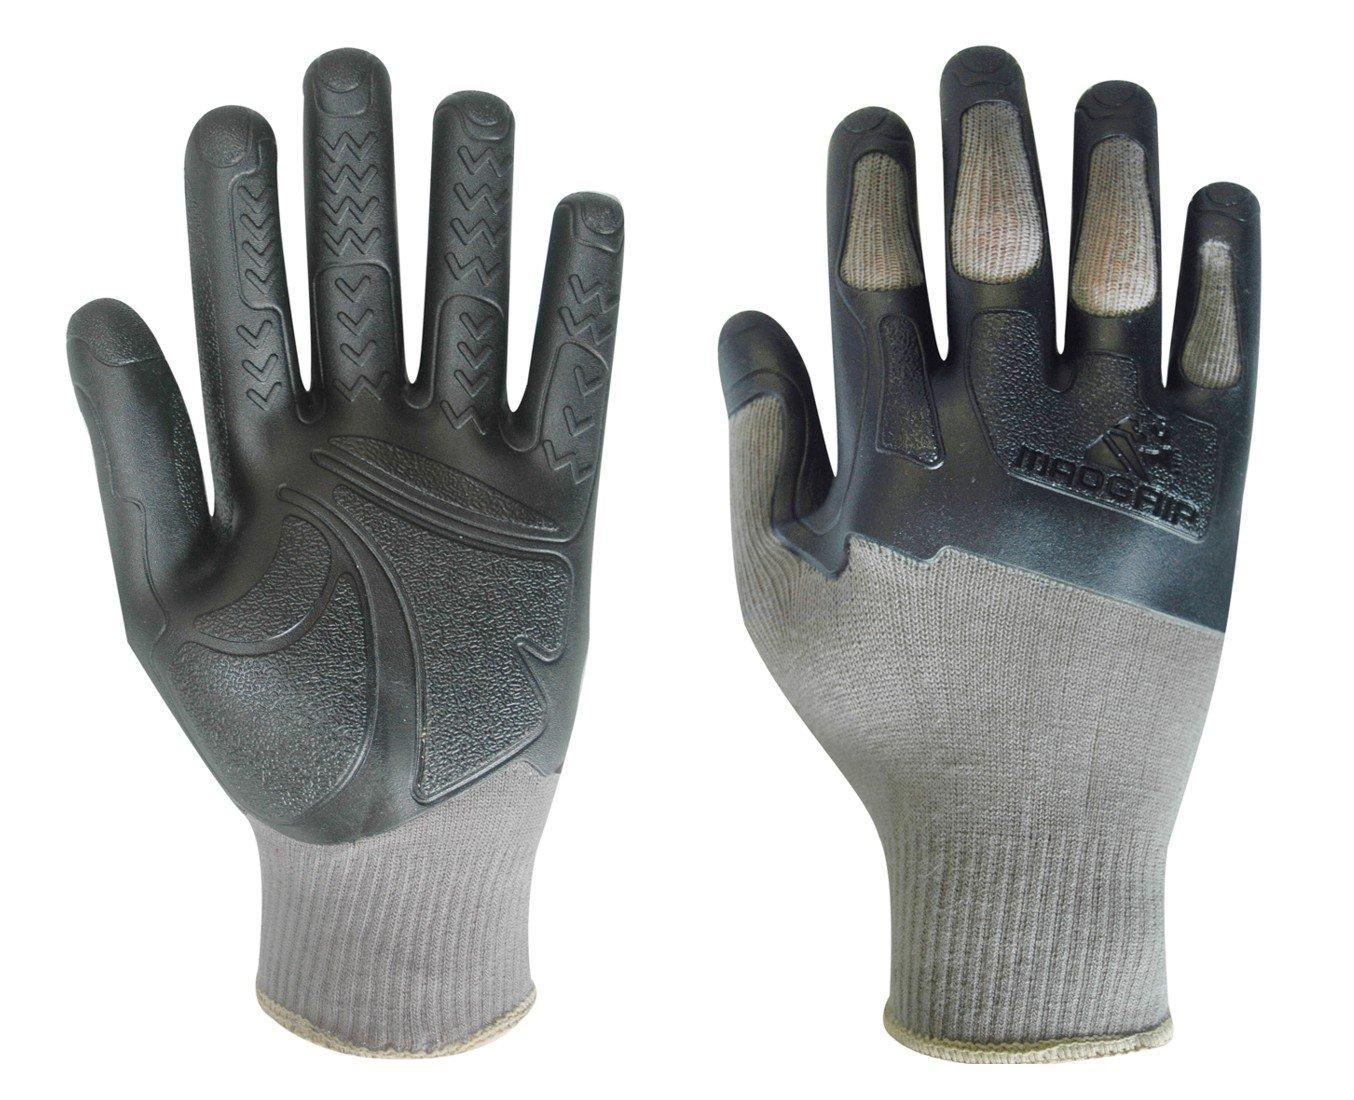 Mens gloves sale uk - Madgrip Pro Palm Knuckler Formula 200 700920 Work Gloves Industrial Quality With Knuckle Protectors Grey Size